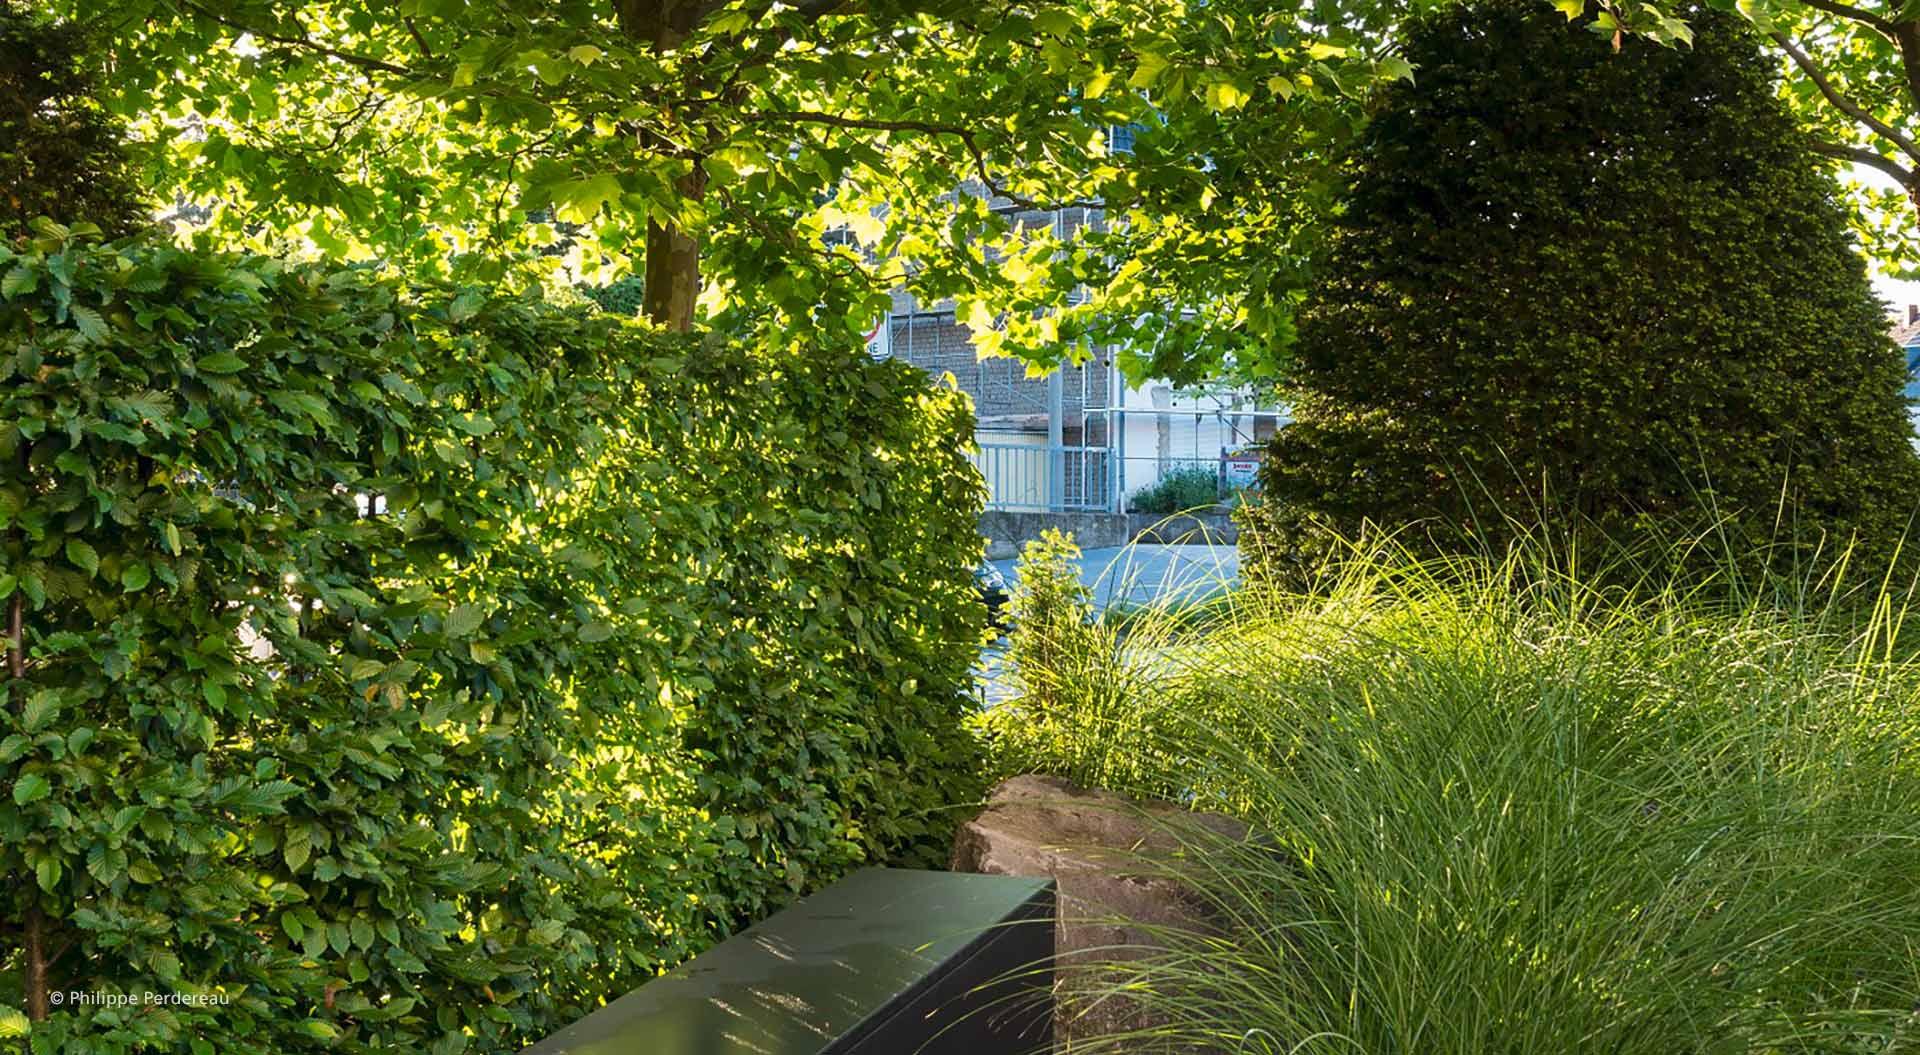 Saftig grüne Hecke mit Sitzbank in Firmengarten